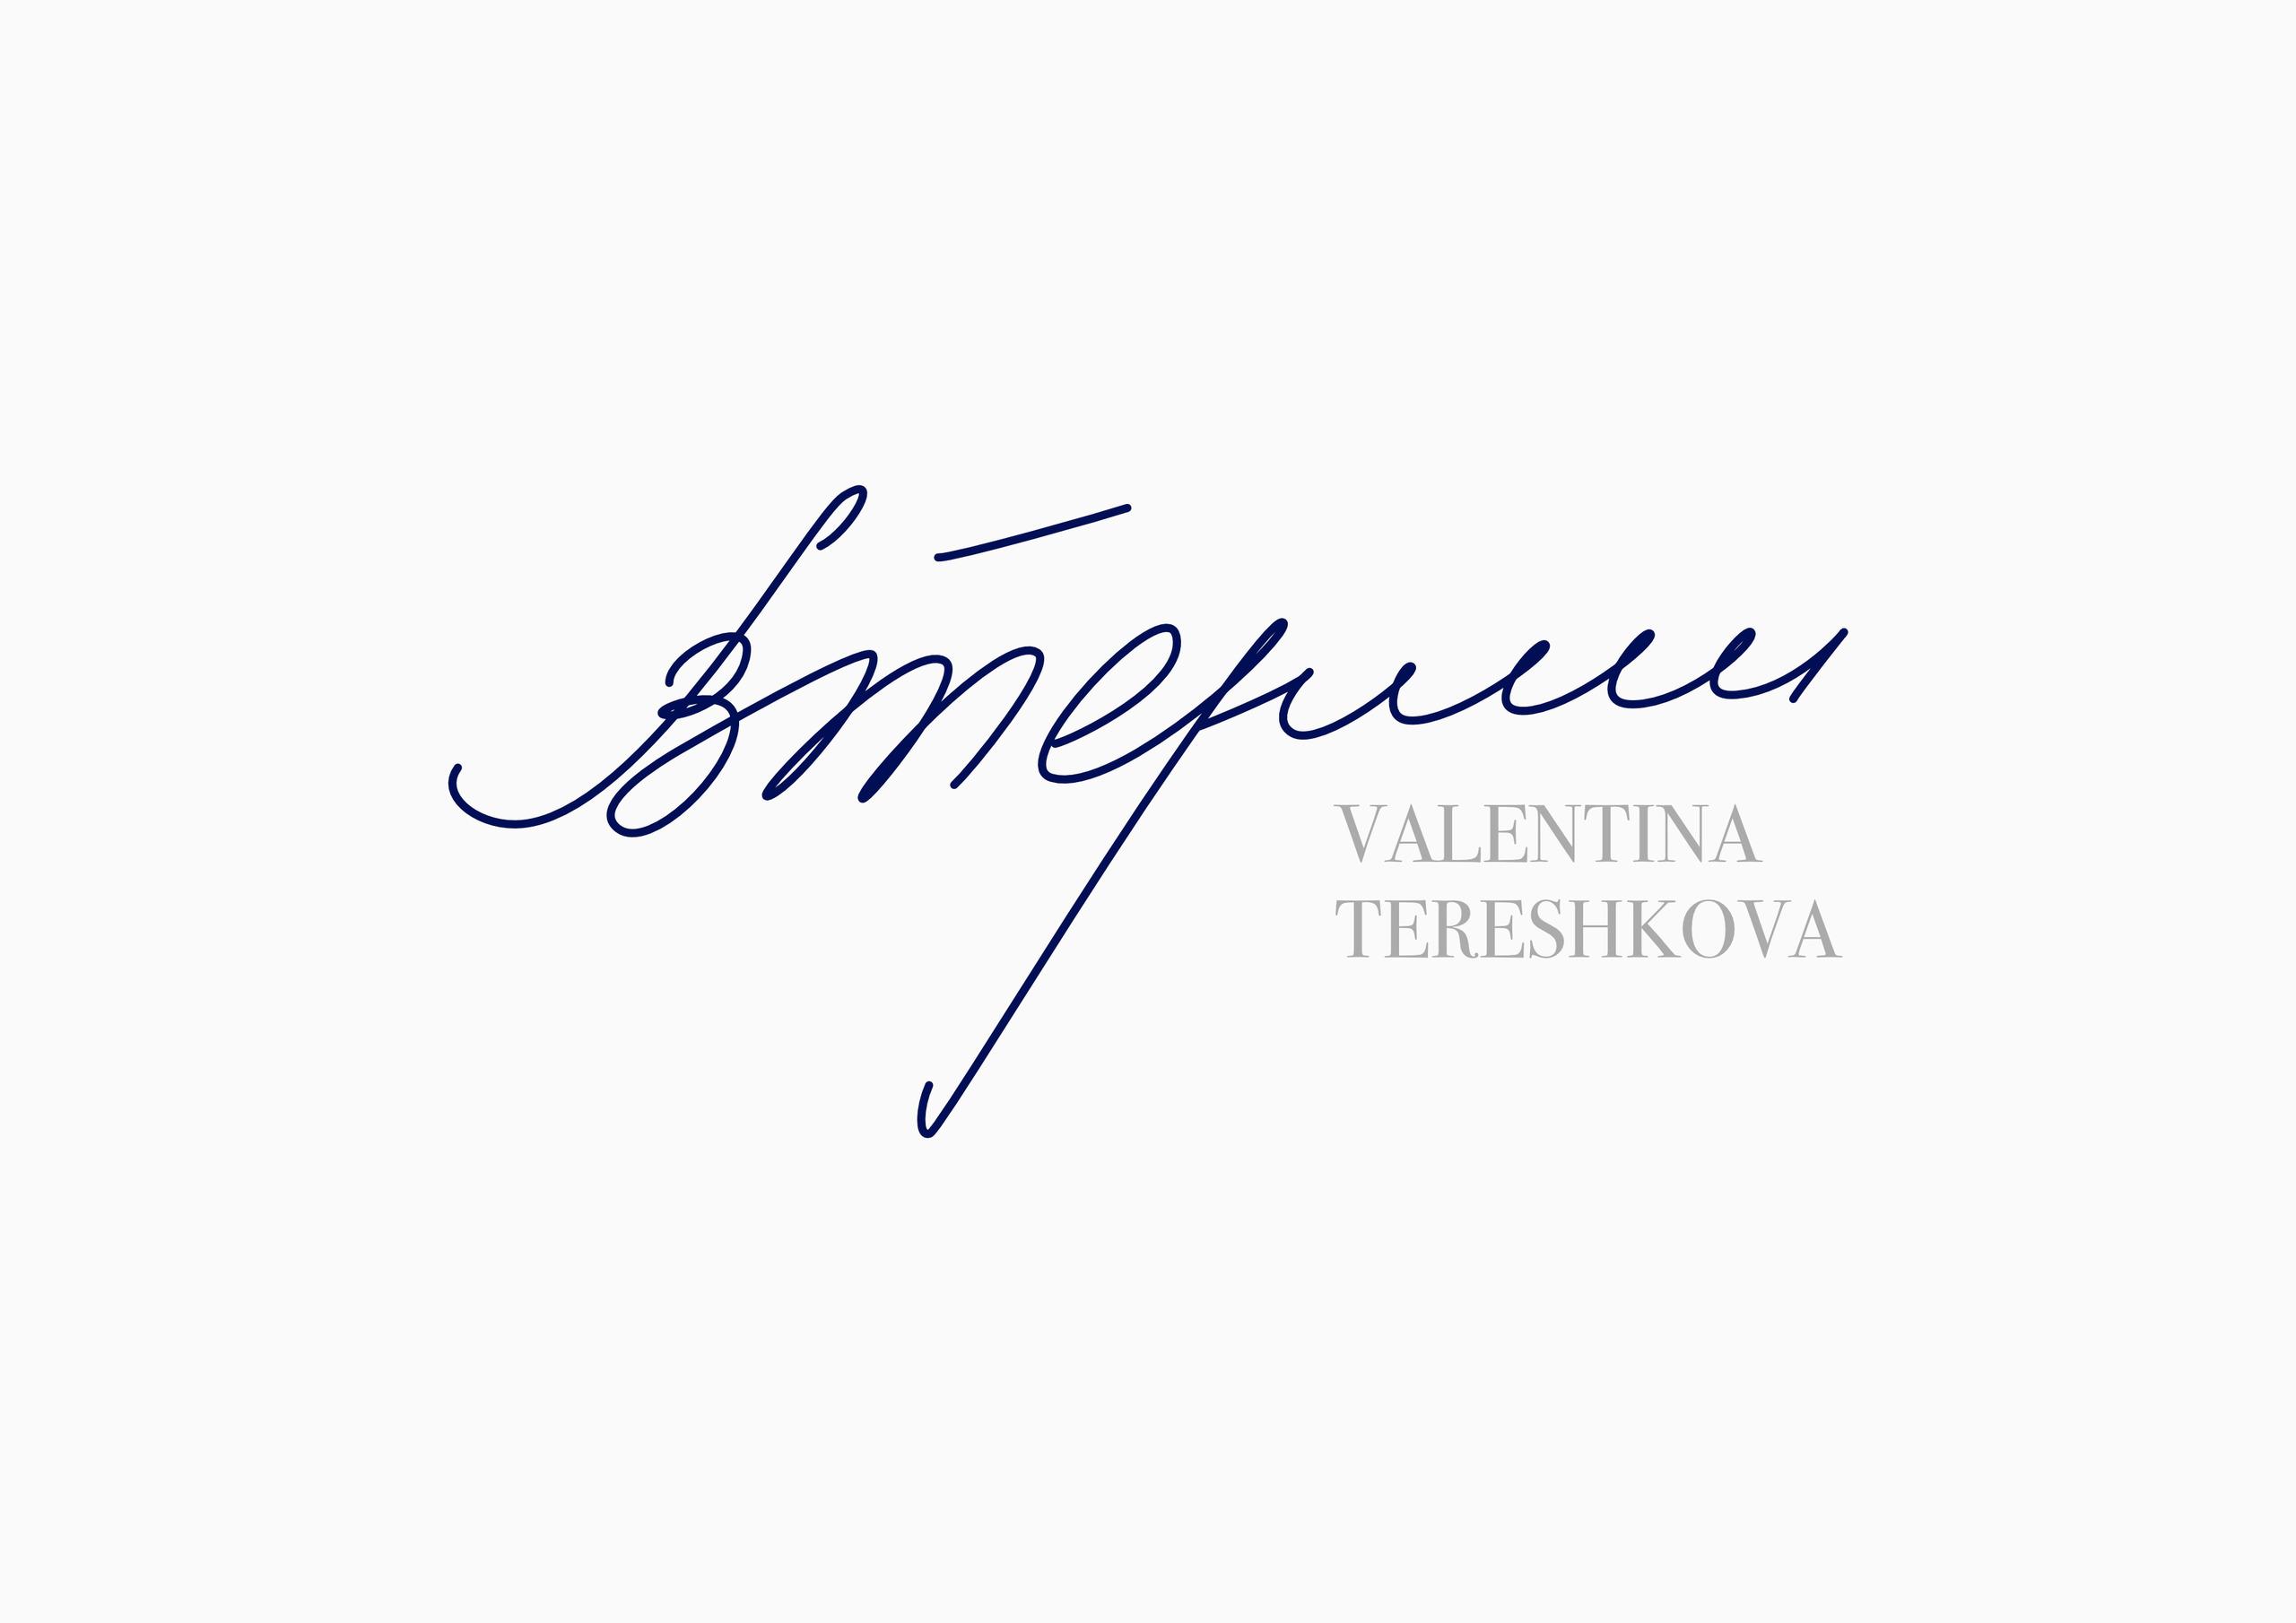 valentina-tereshkova.png